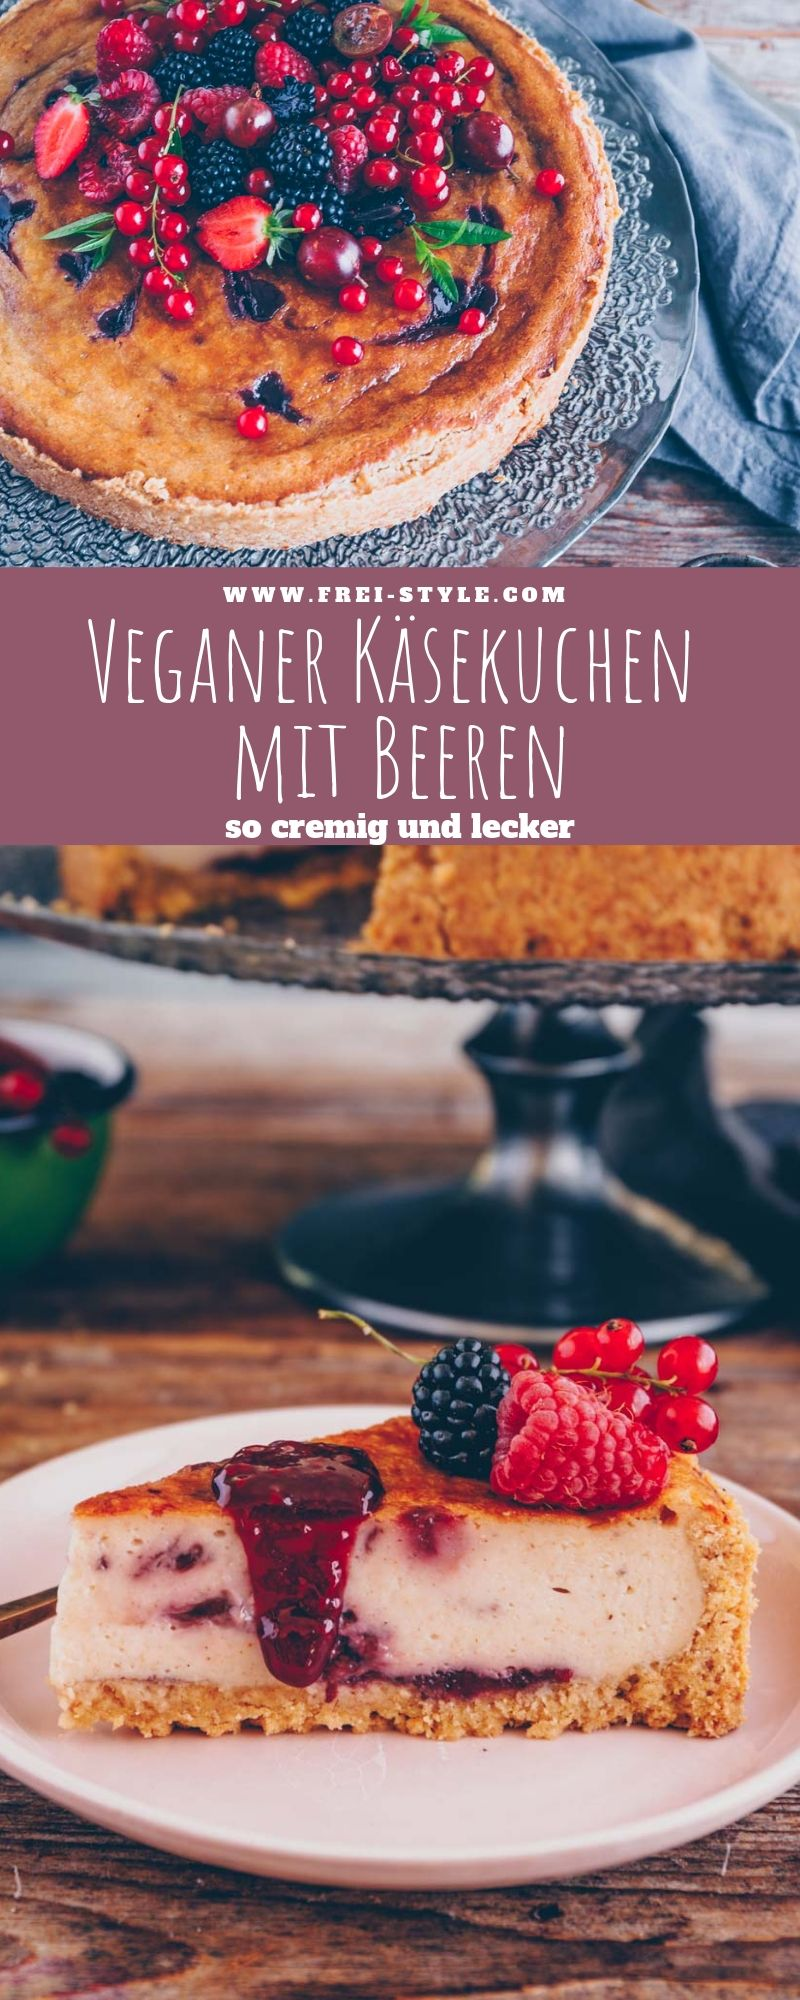 Veganer Käsekuchen mit Himbeeren